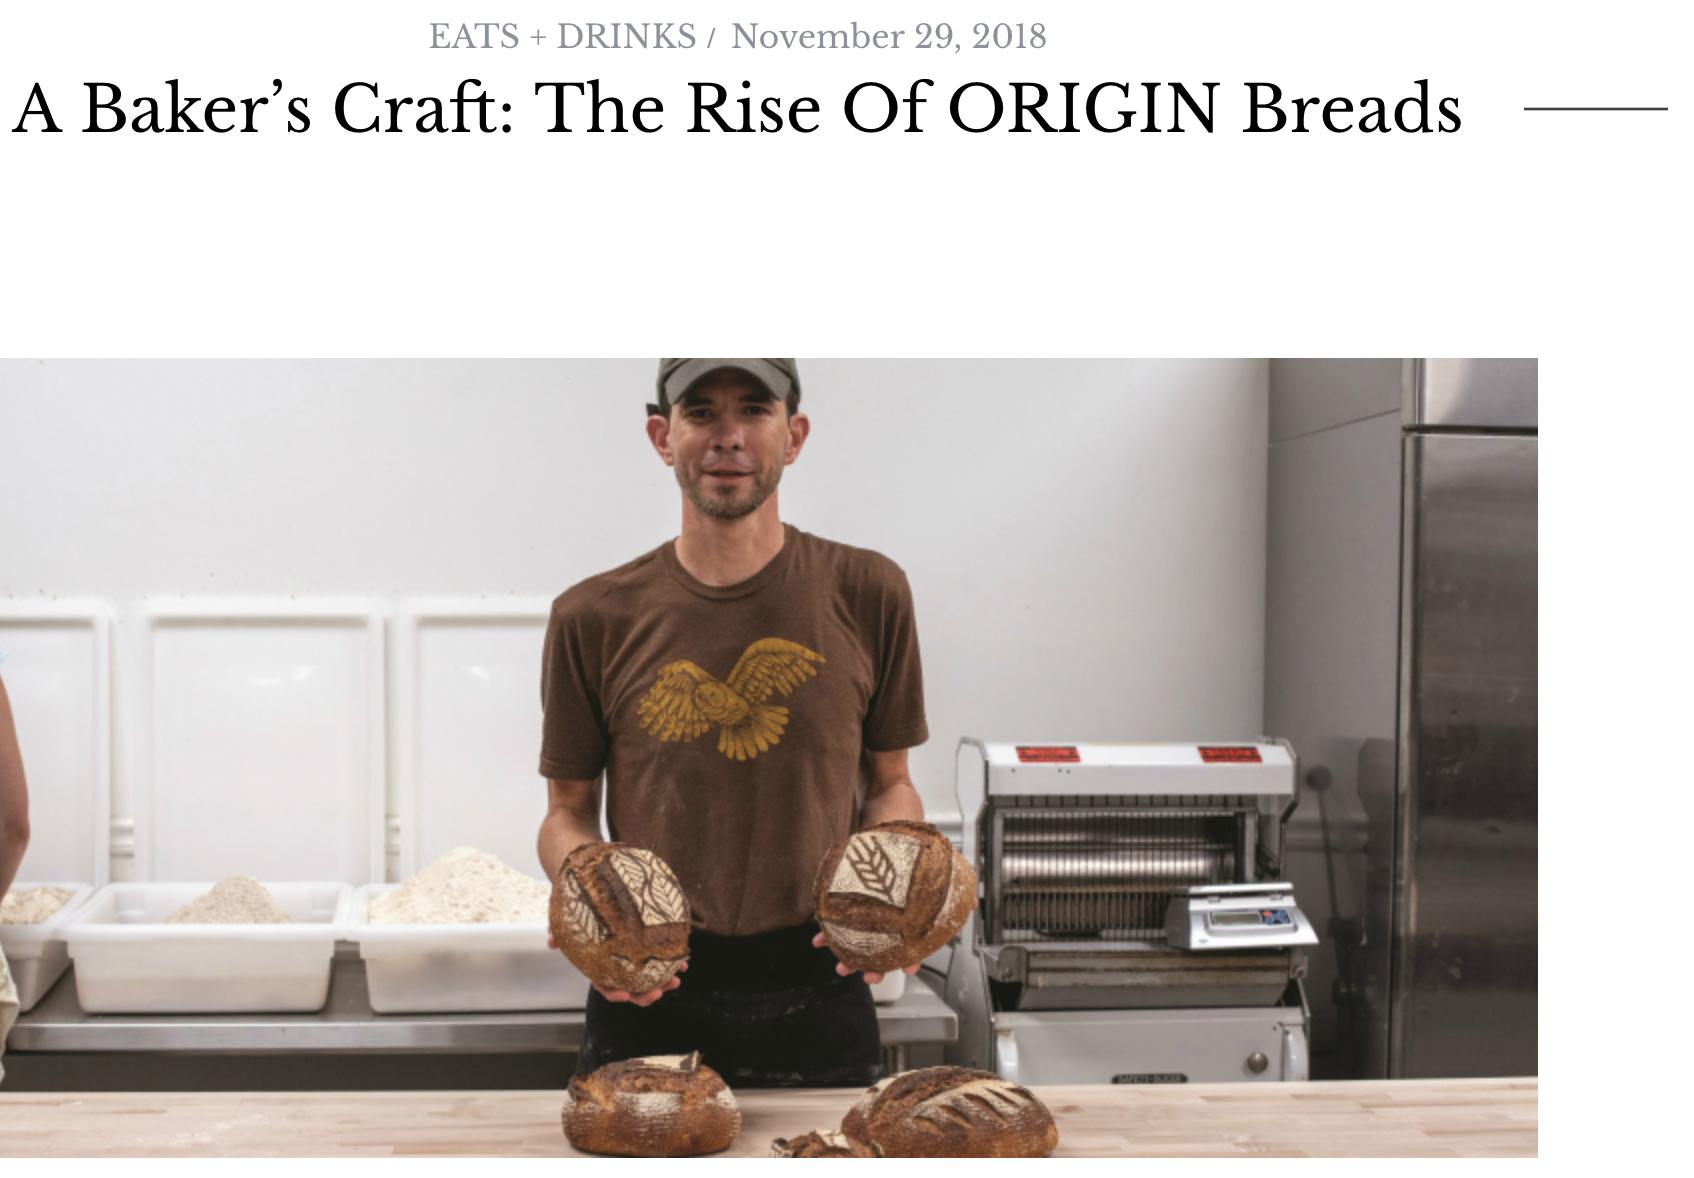 A Baker's Craft: The Rise of ORIGIN Breads_Brava Magazine